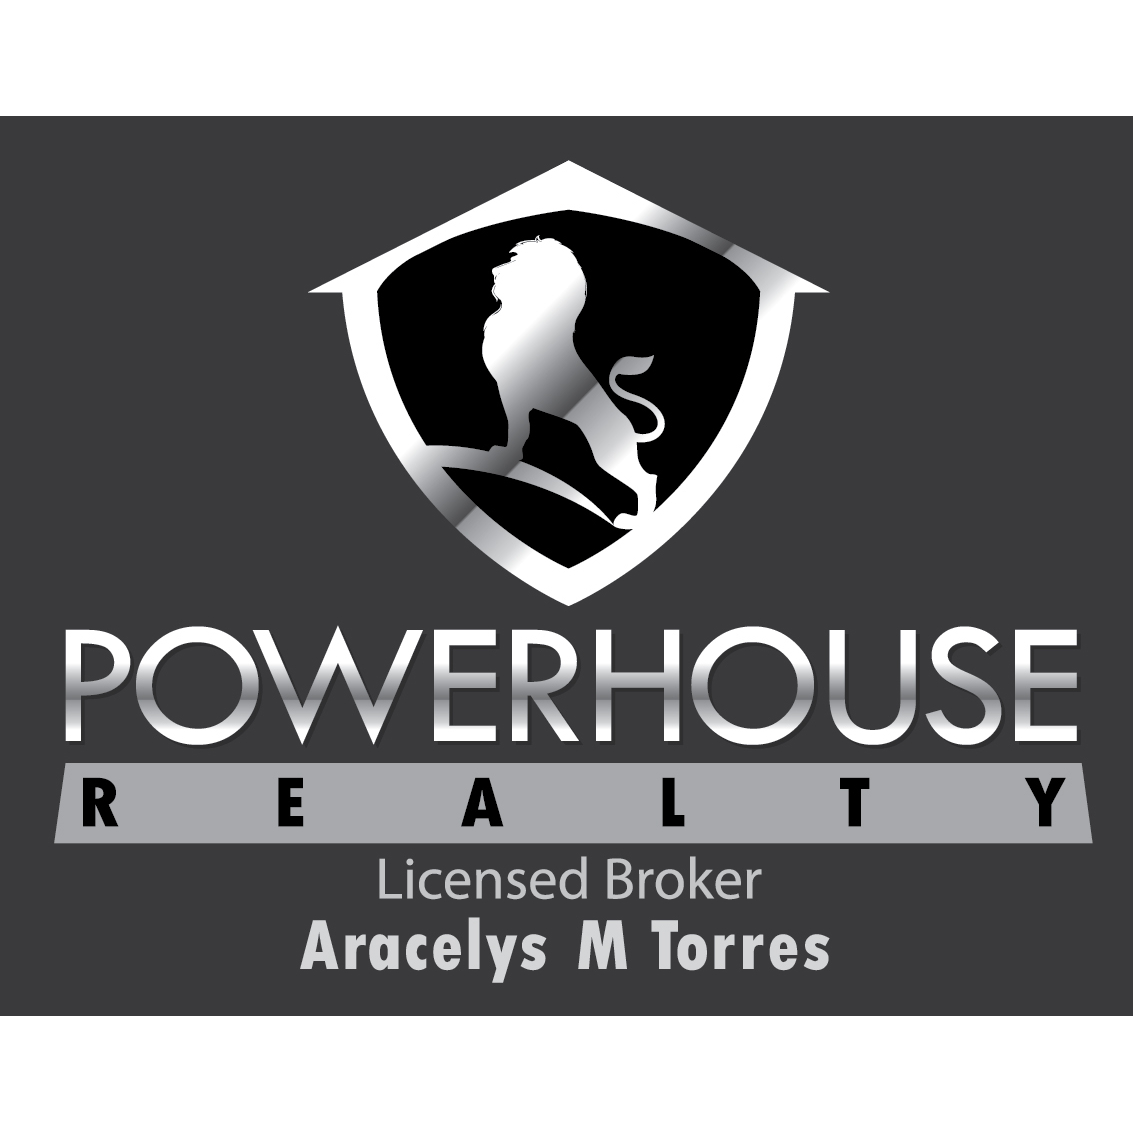 Powerhouse Realty